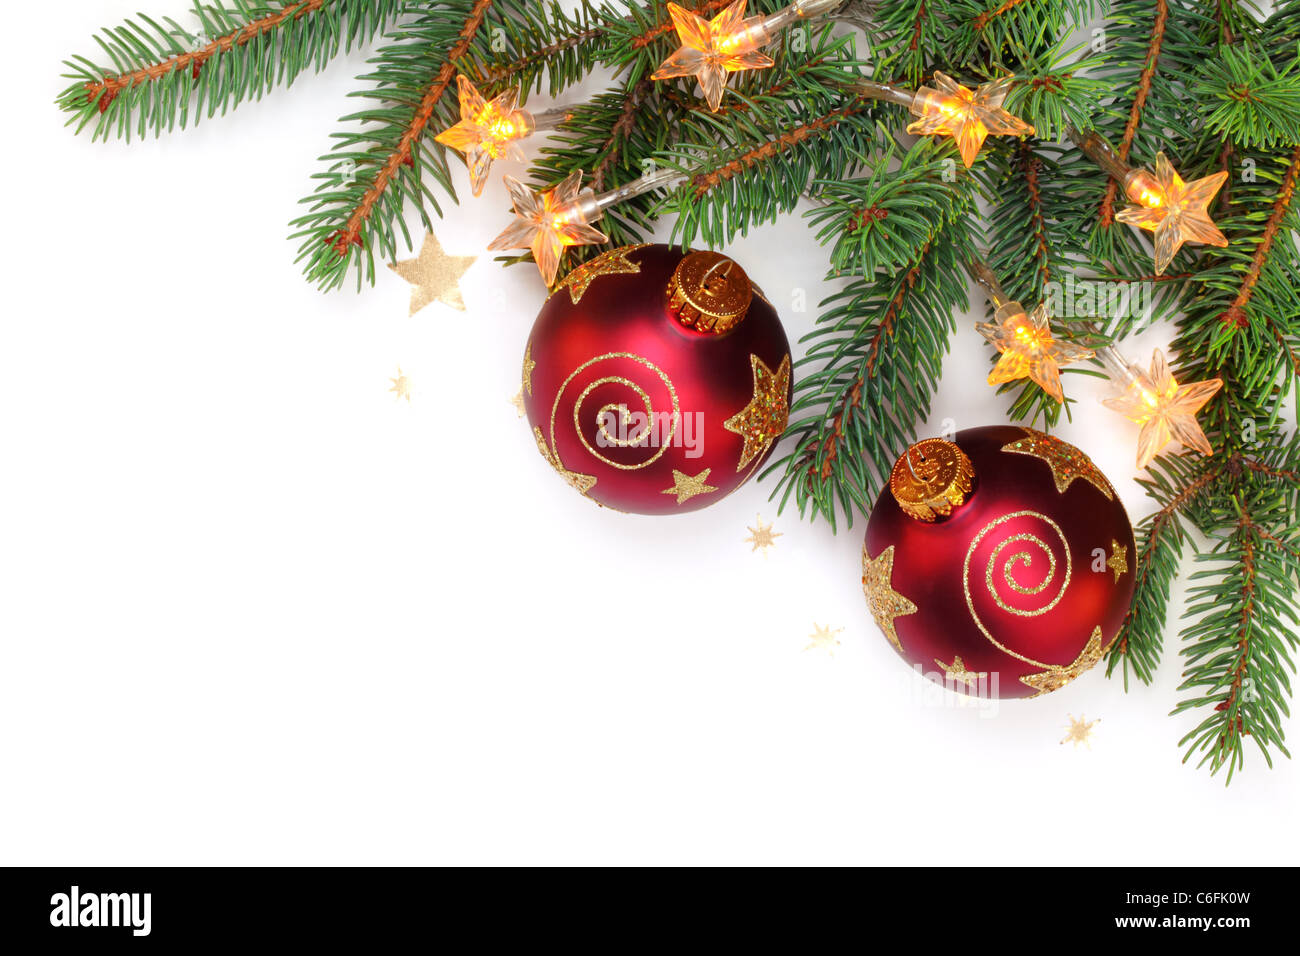 Weihnachtsbilder Tannenzweig.Christmas Tree Branches Background Stock Photos Christmas Tree